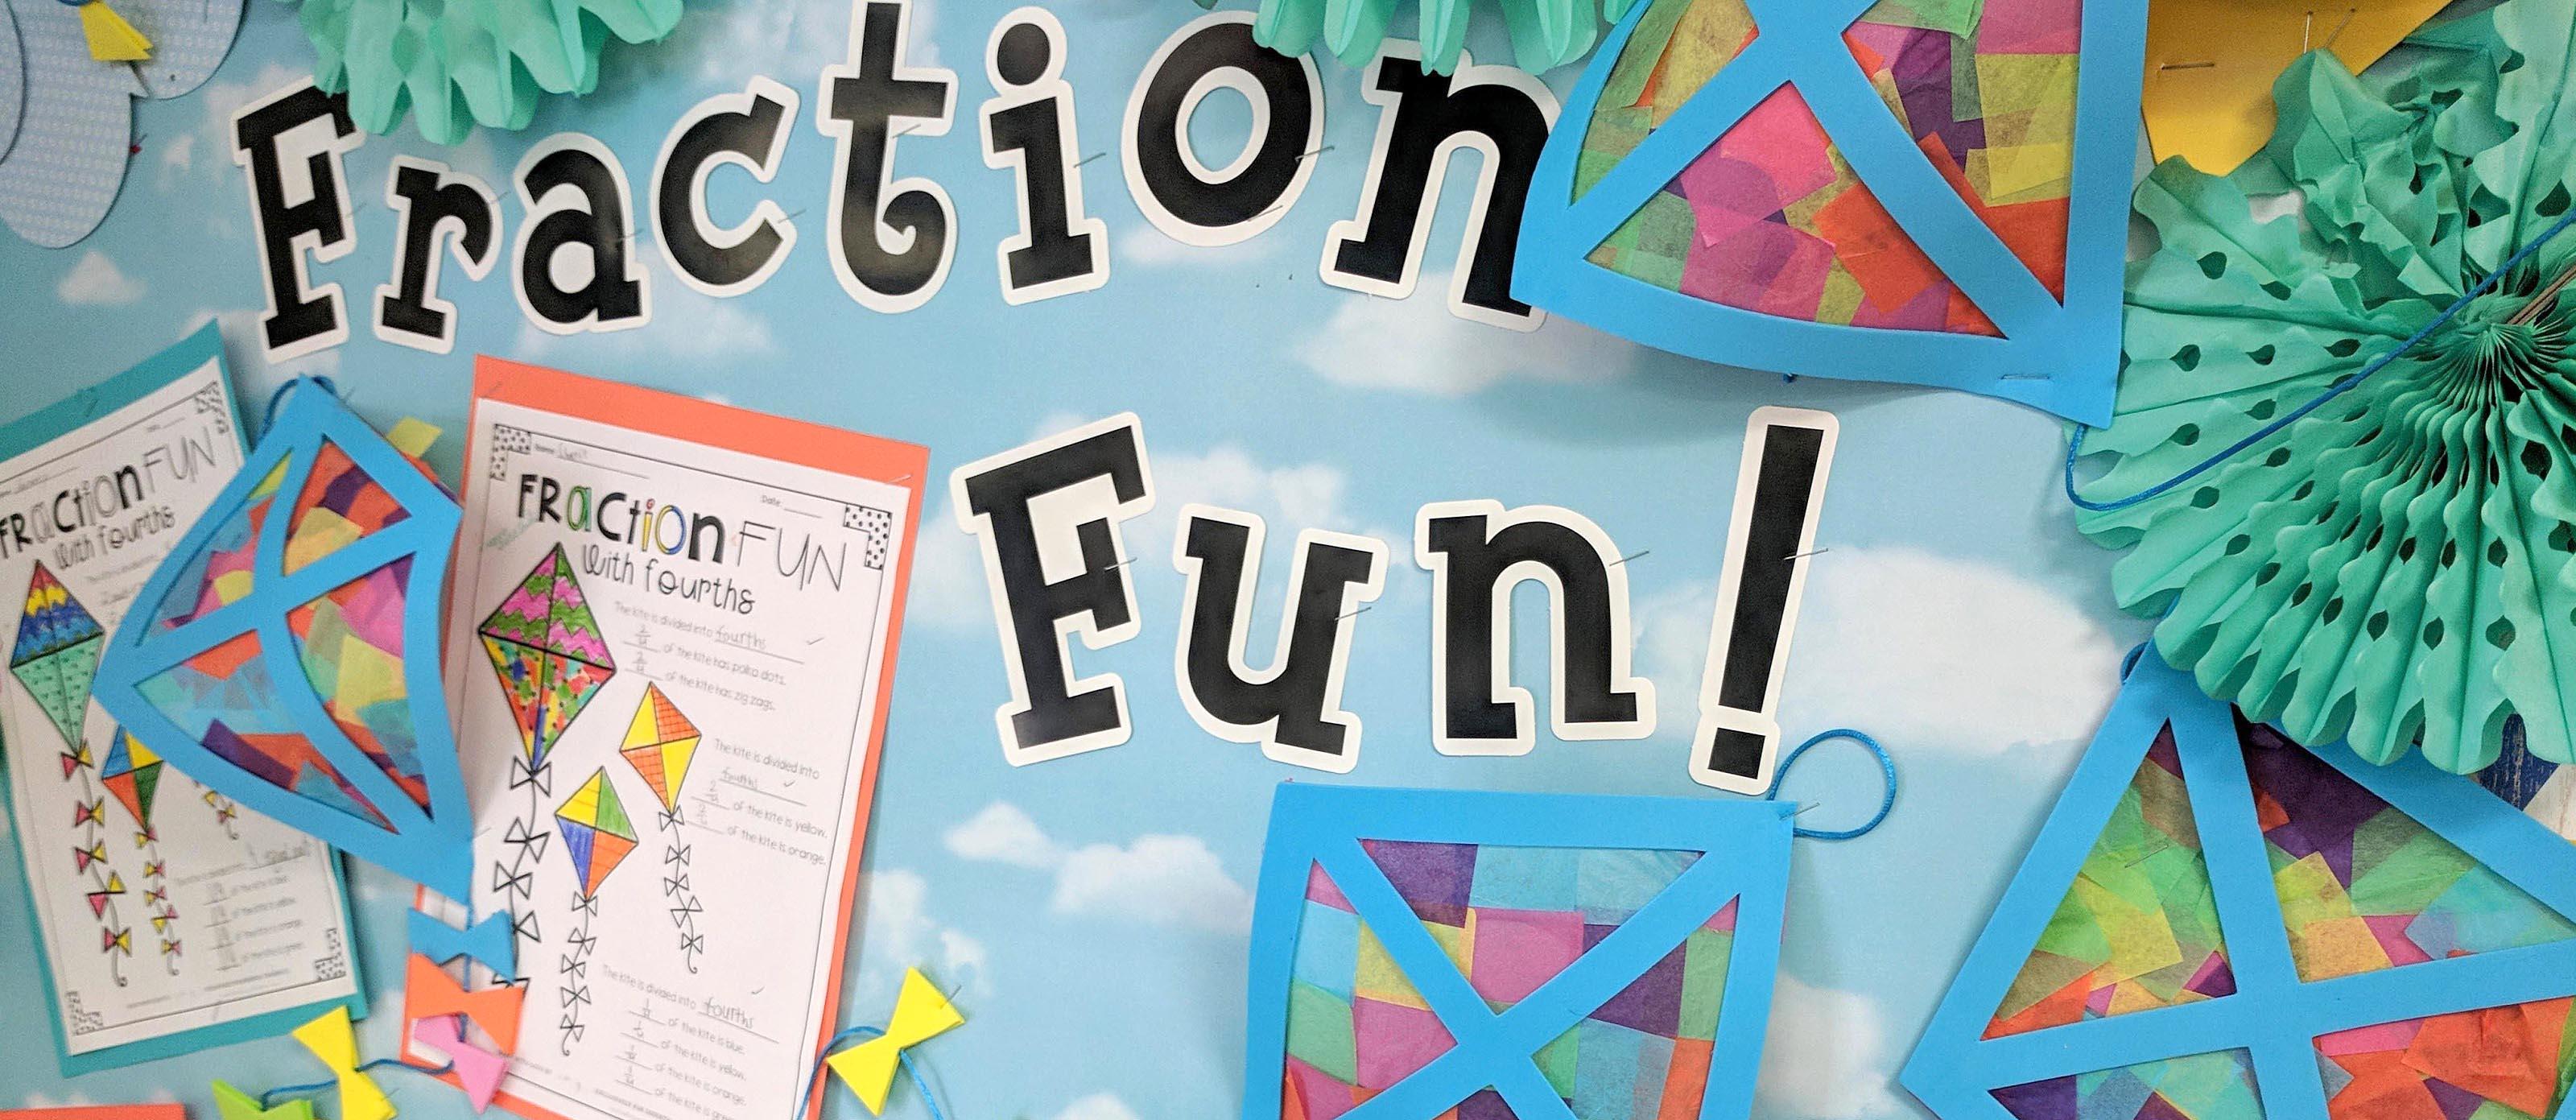 Fun Fraction Activity Using Fourths   Fun20